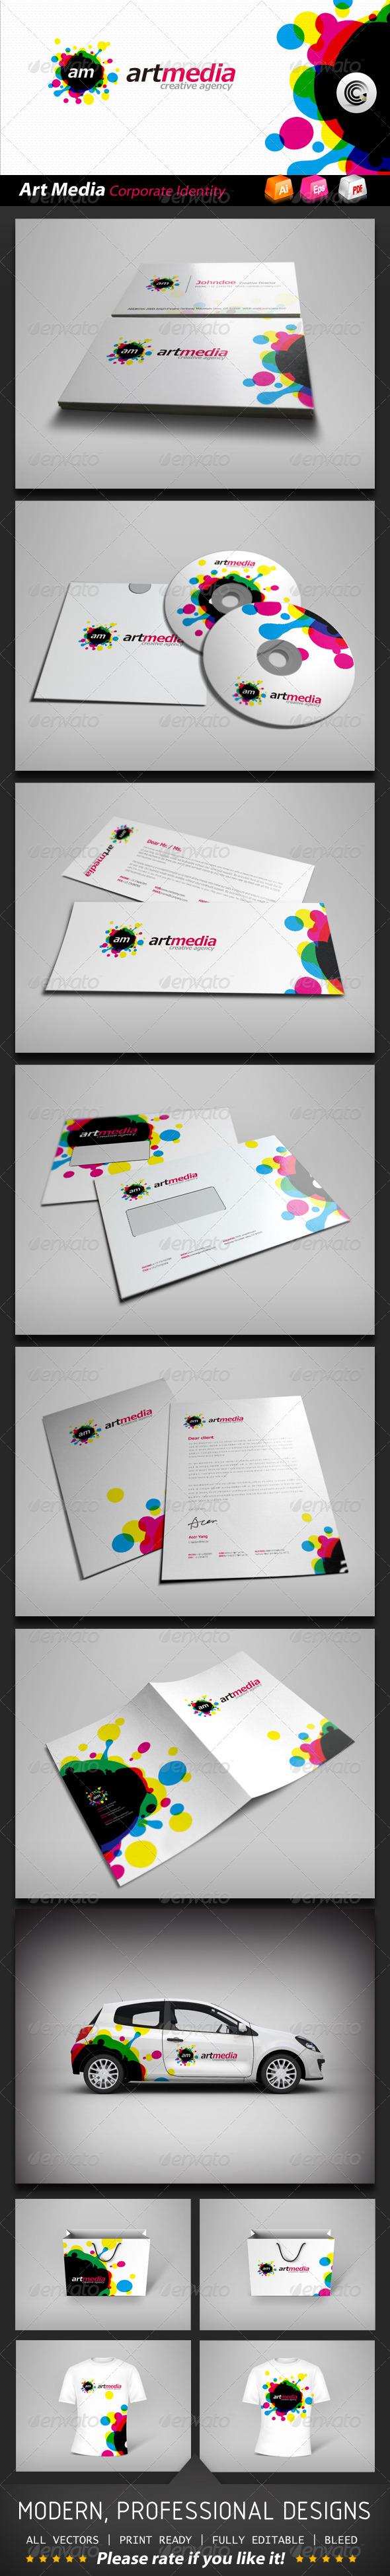 Art Media Corporate Identity - Stationery Print Templates